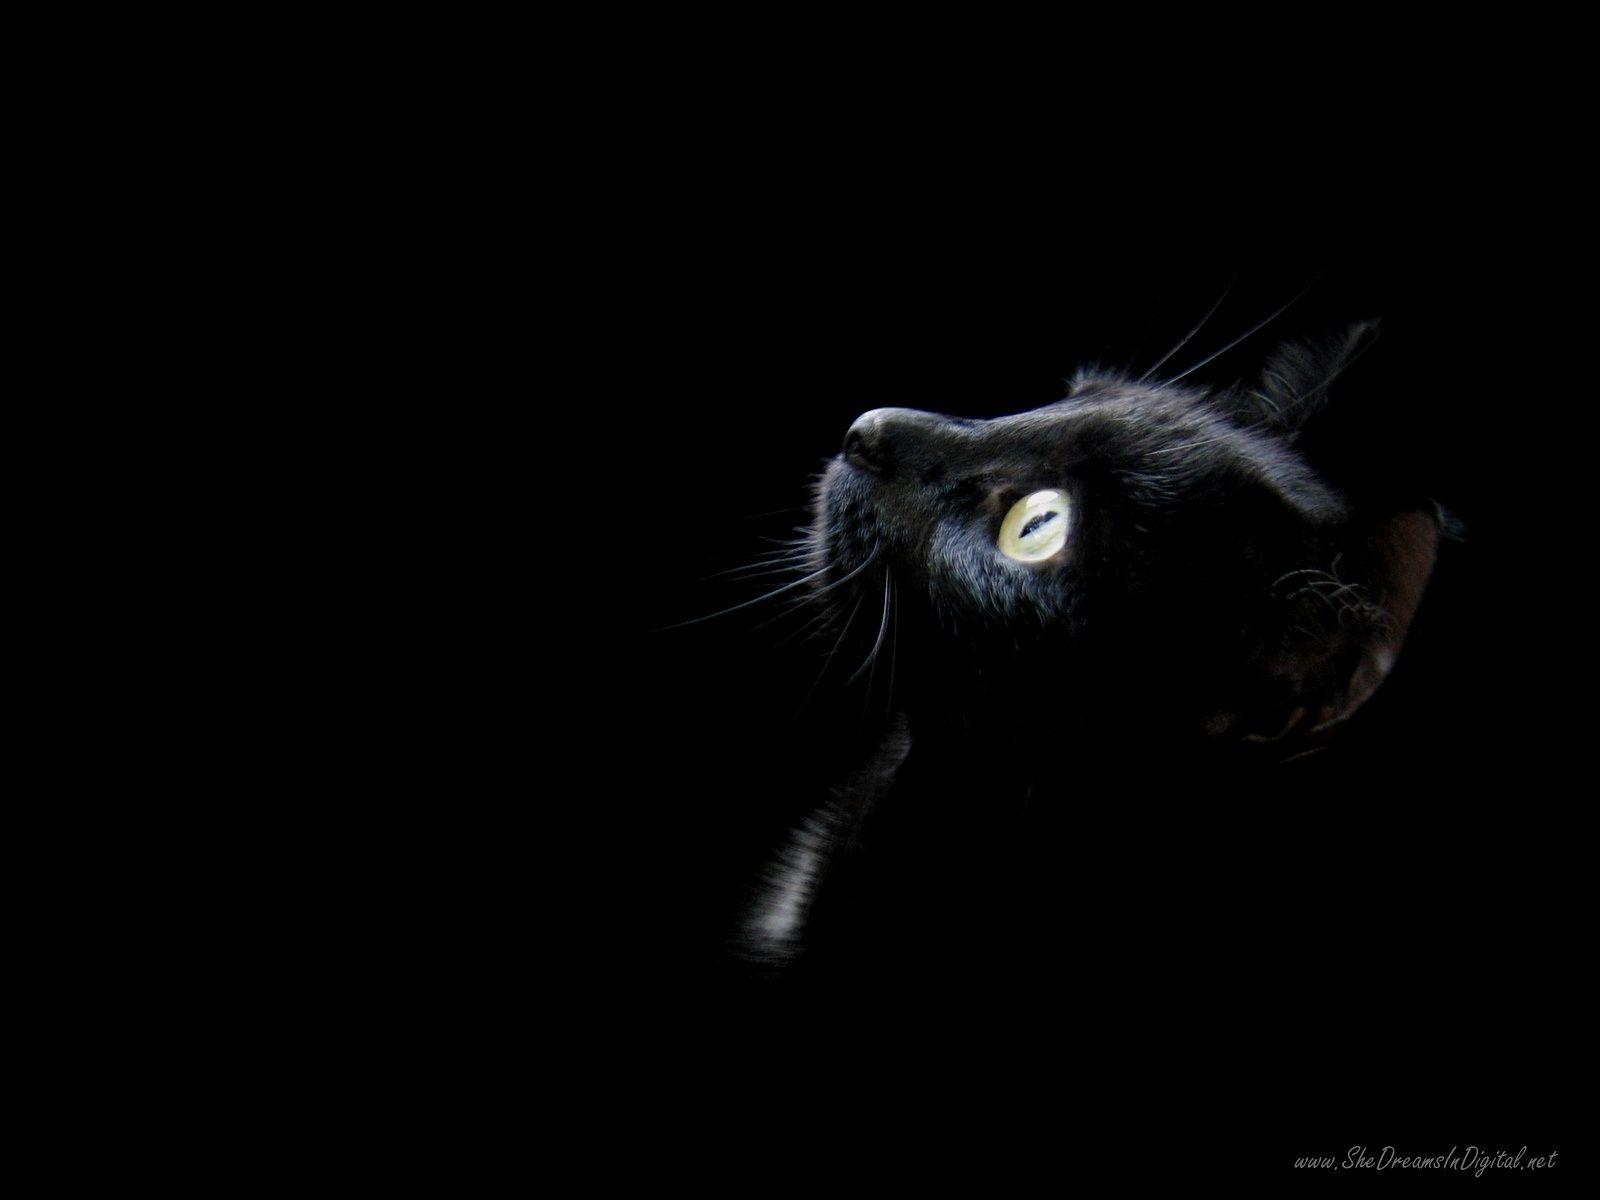 Kabe Wallpaper 313 Black Wallpaper Black Cat Halloween Cat Wallpaper Black Cat